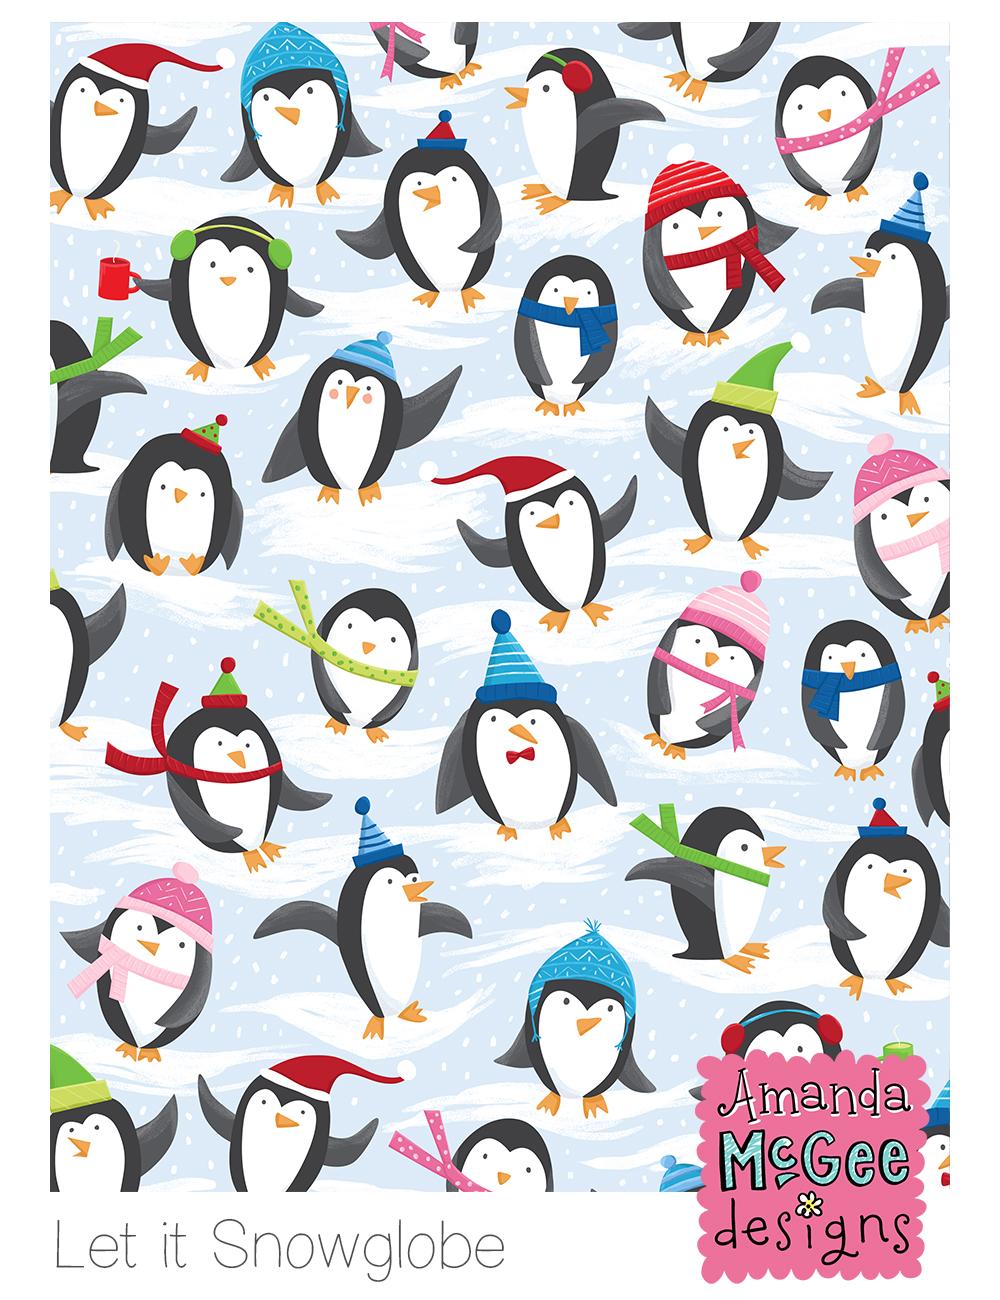 AmandaMcGee_SurfacePattern_LetItSnowglobe-Penguins.jpg